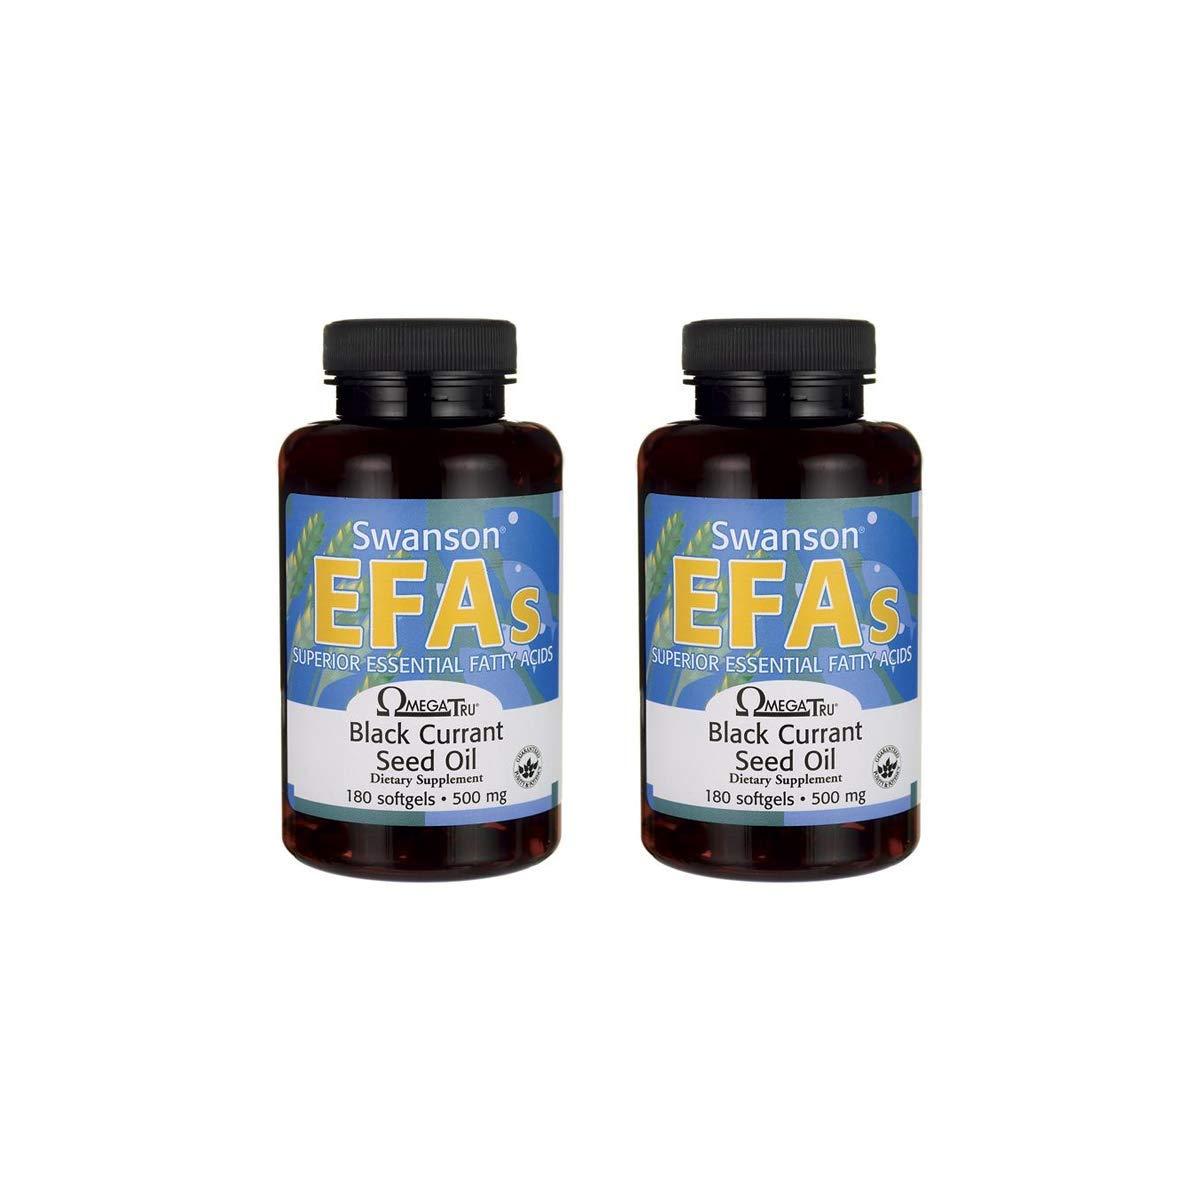 Swanson Black Currant Seed Oil Gla (Omegatru) 500 mg 180 Sgels 2 Pack